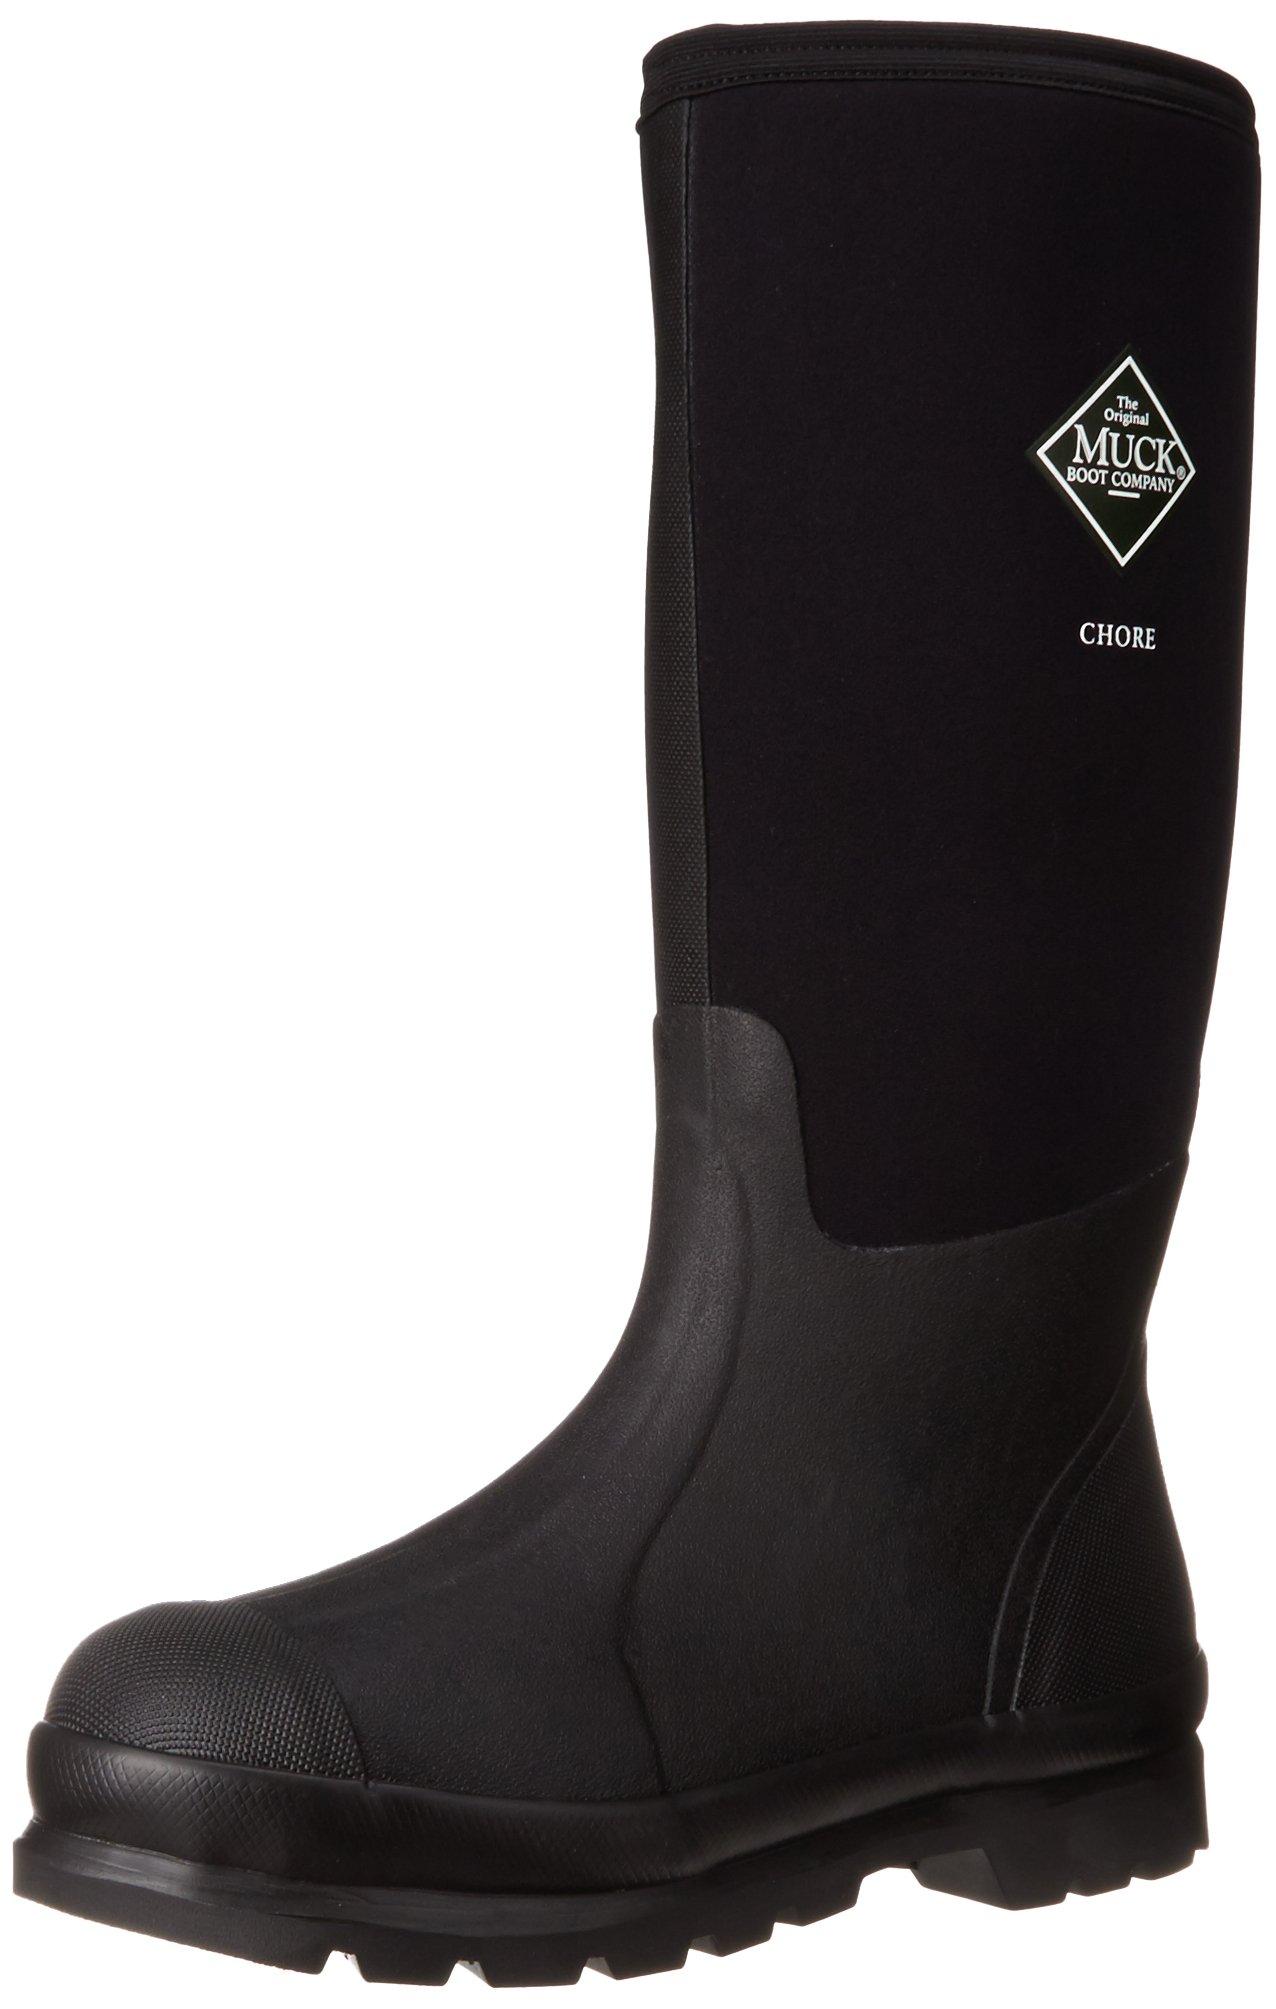 The Original MuckBoots Adult Chore Hi-Cut Boot,Black,Men's 8 M US / Women's 9 M US